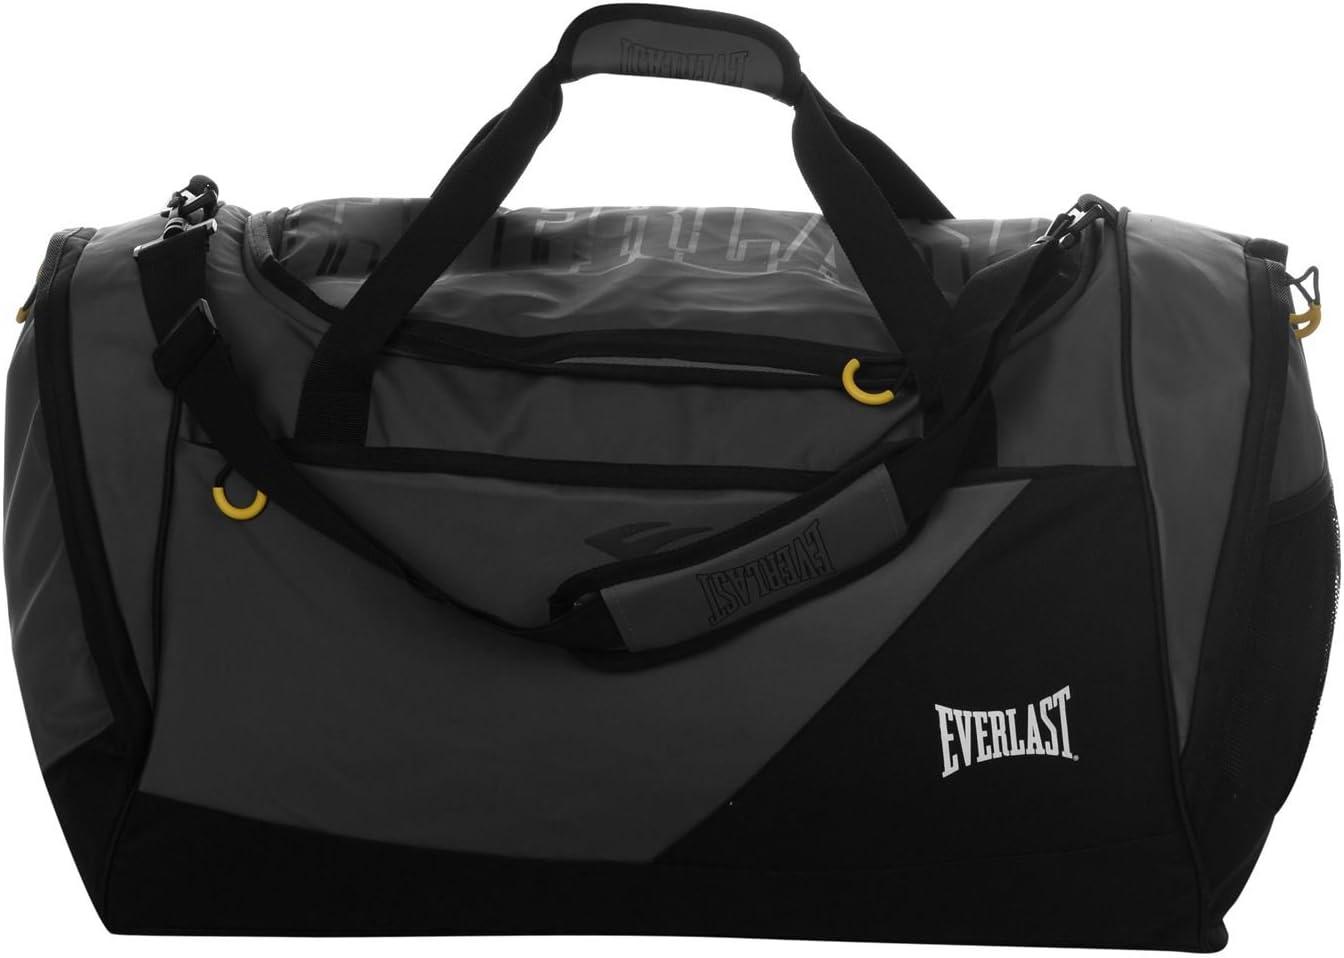 Everlast Unisexe Sac De Sport Gym Sac Duffel Holdall Bagage Charcoal//Noir